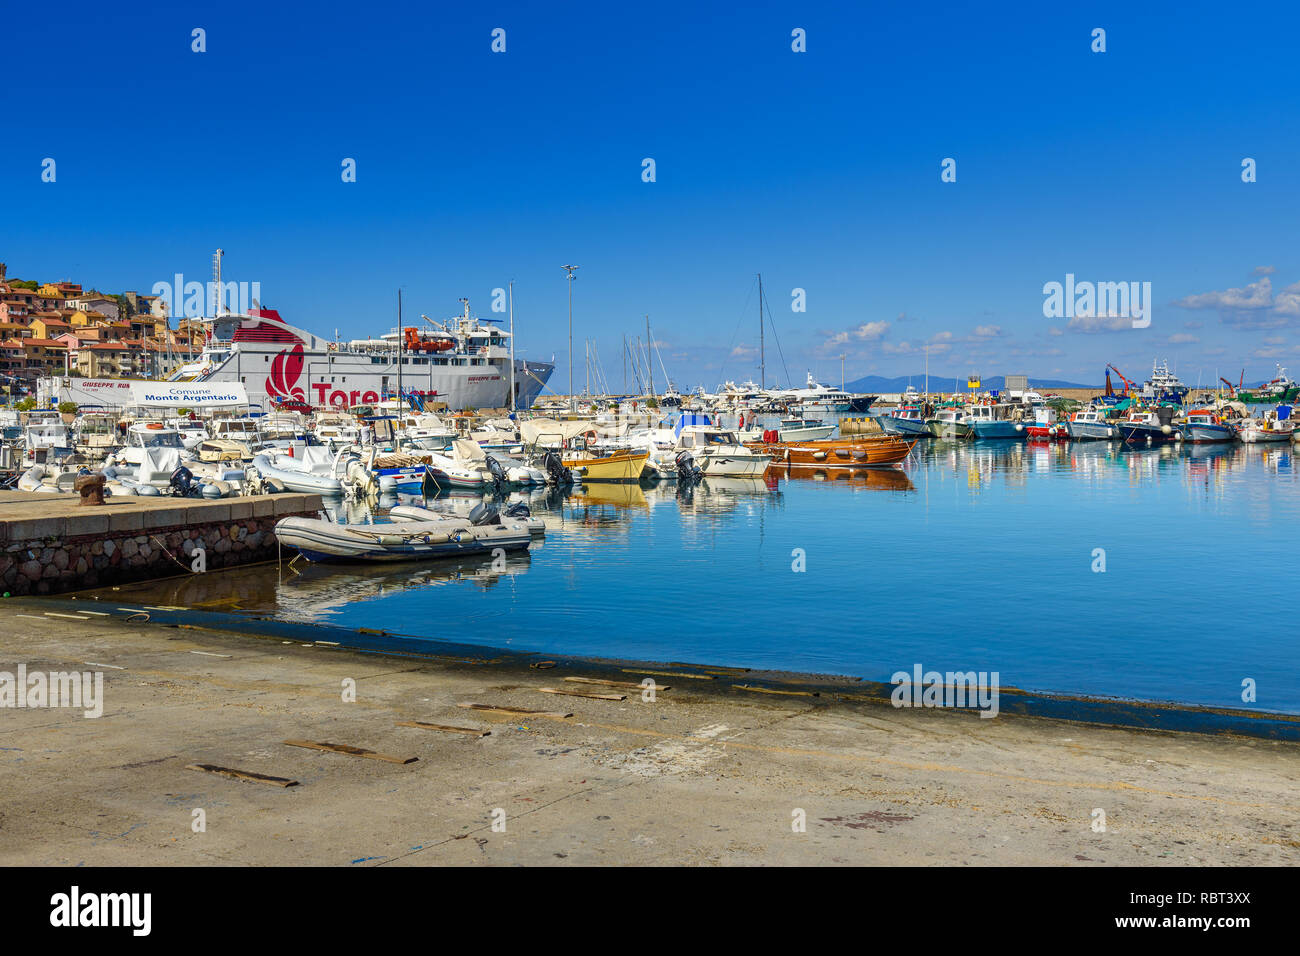 Porto Santo Stefano, Italy - October 09, 2018: View of harbor seafront in seaport town Porto Santo Stefano in Monte Argentario. Tuscany - Stock Image